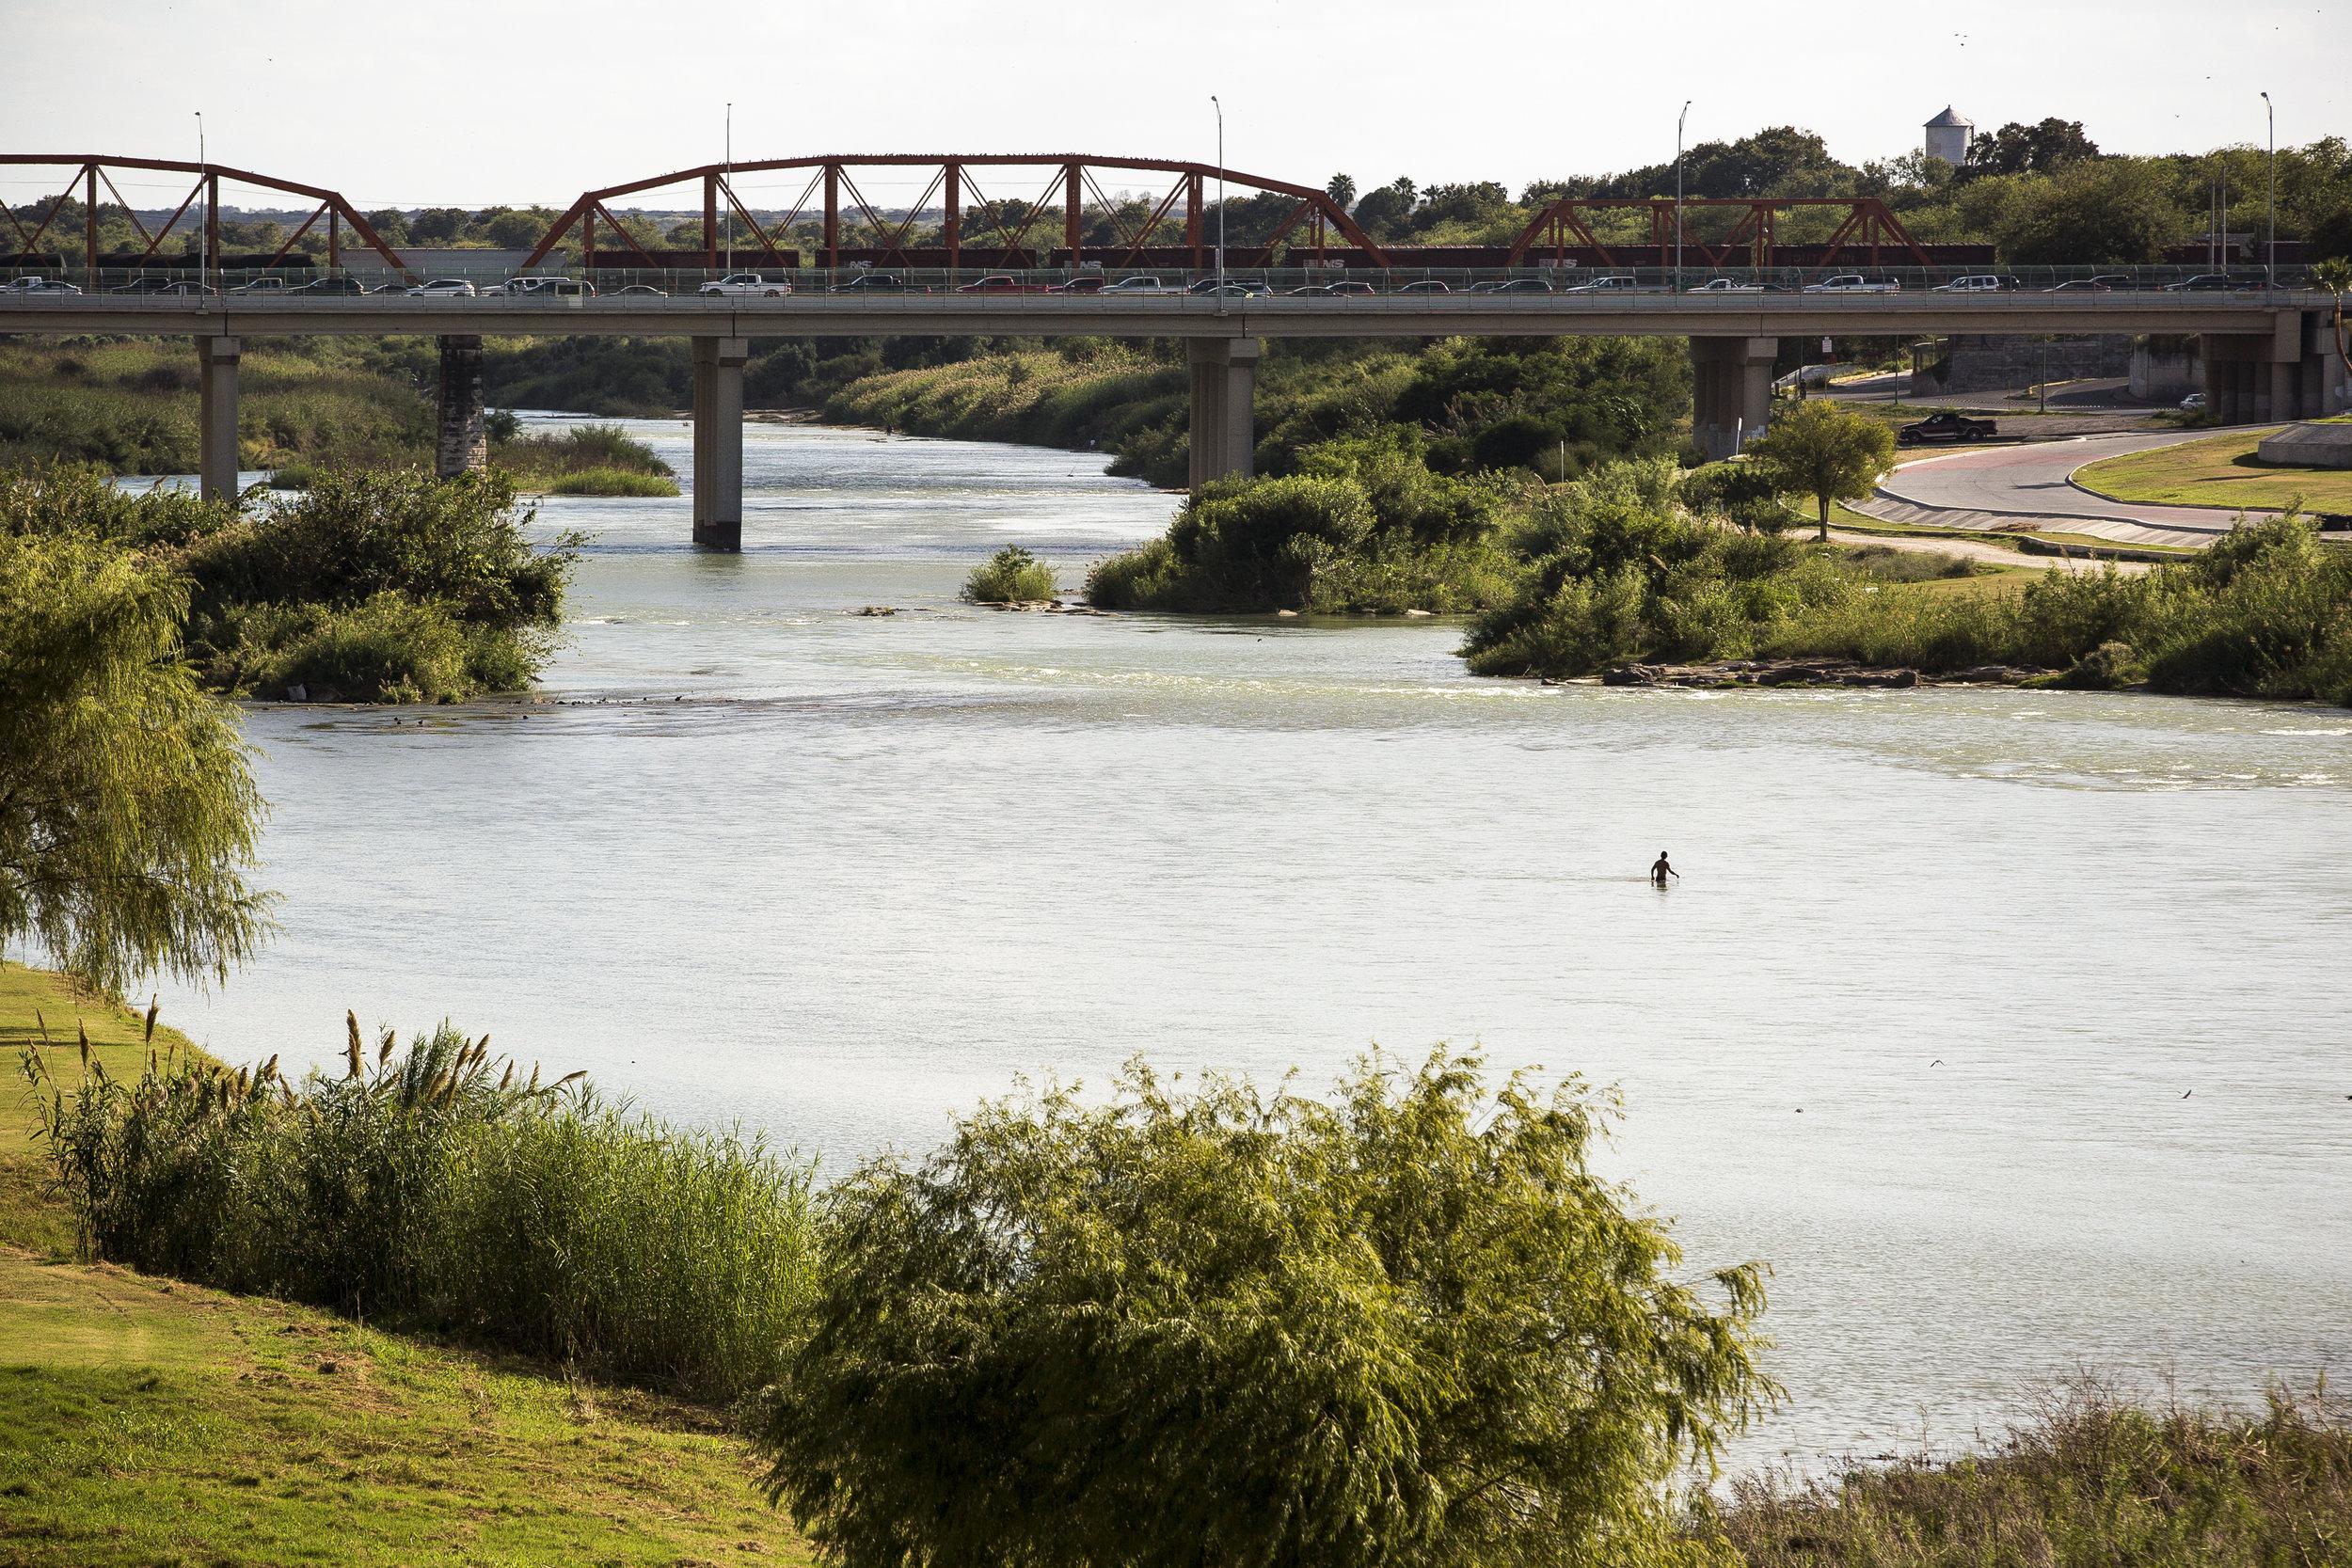 The international bridge and Rio Grande river between Eagle Pass and Piedras Negras. Photo by Martin do Nascimento